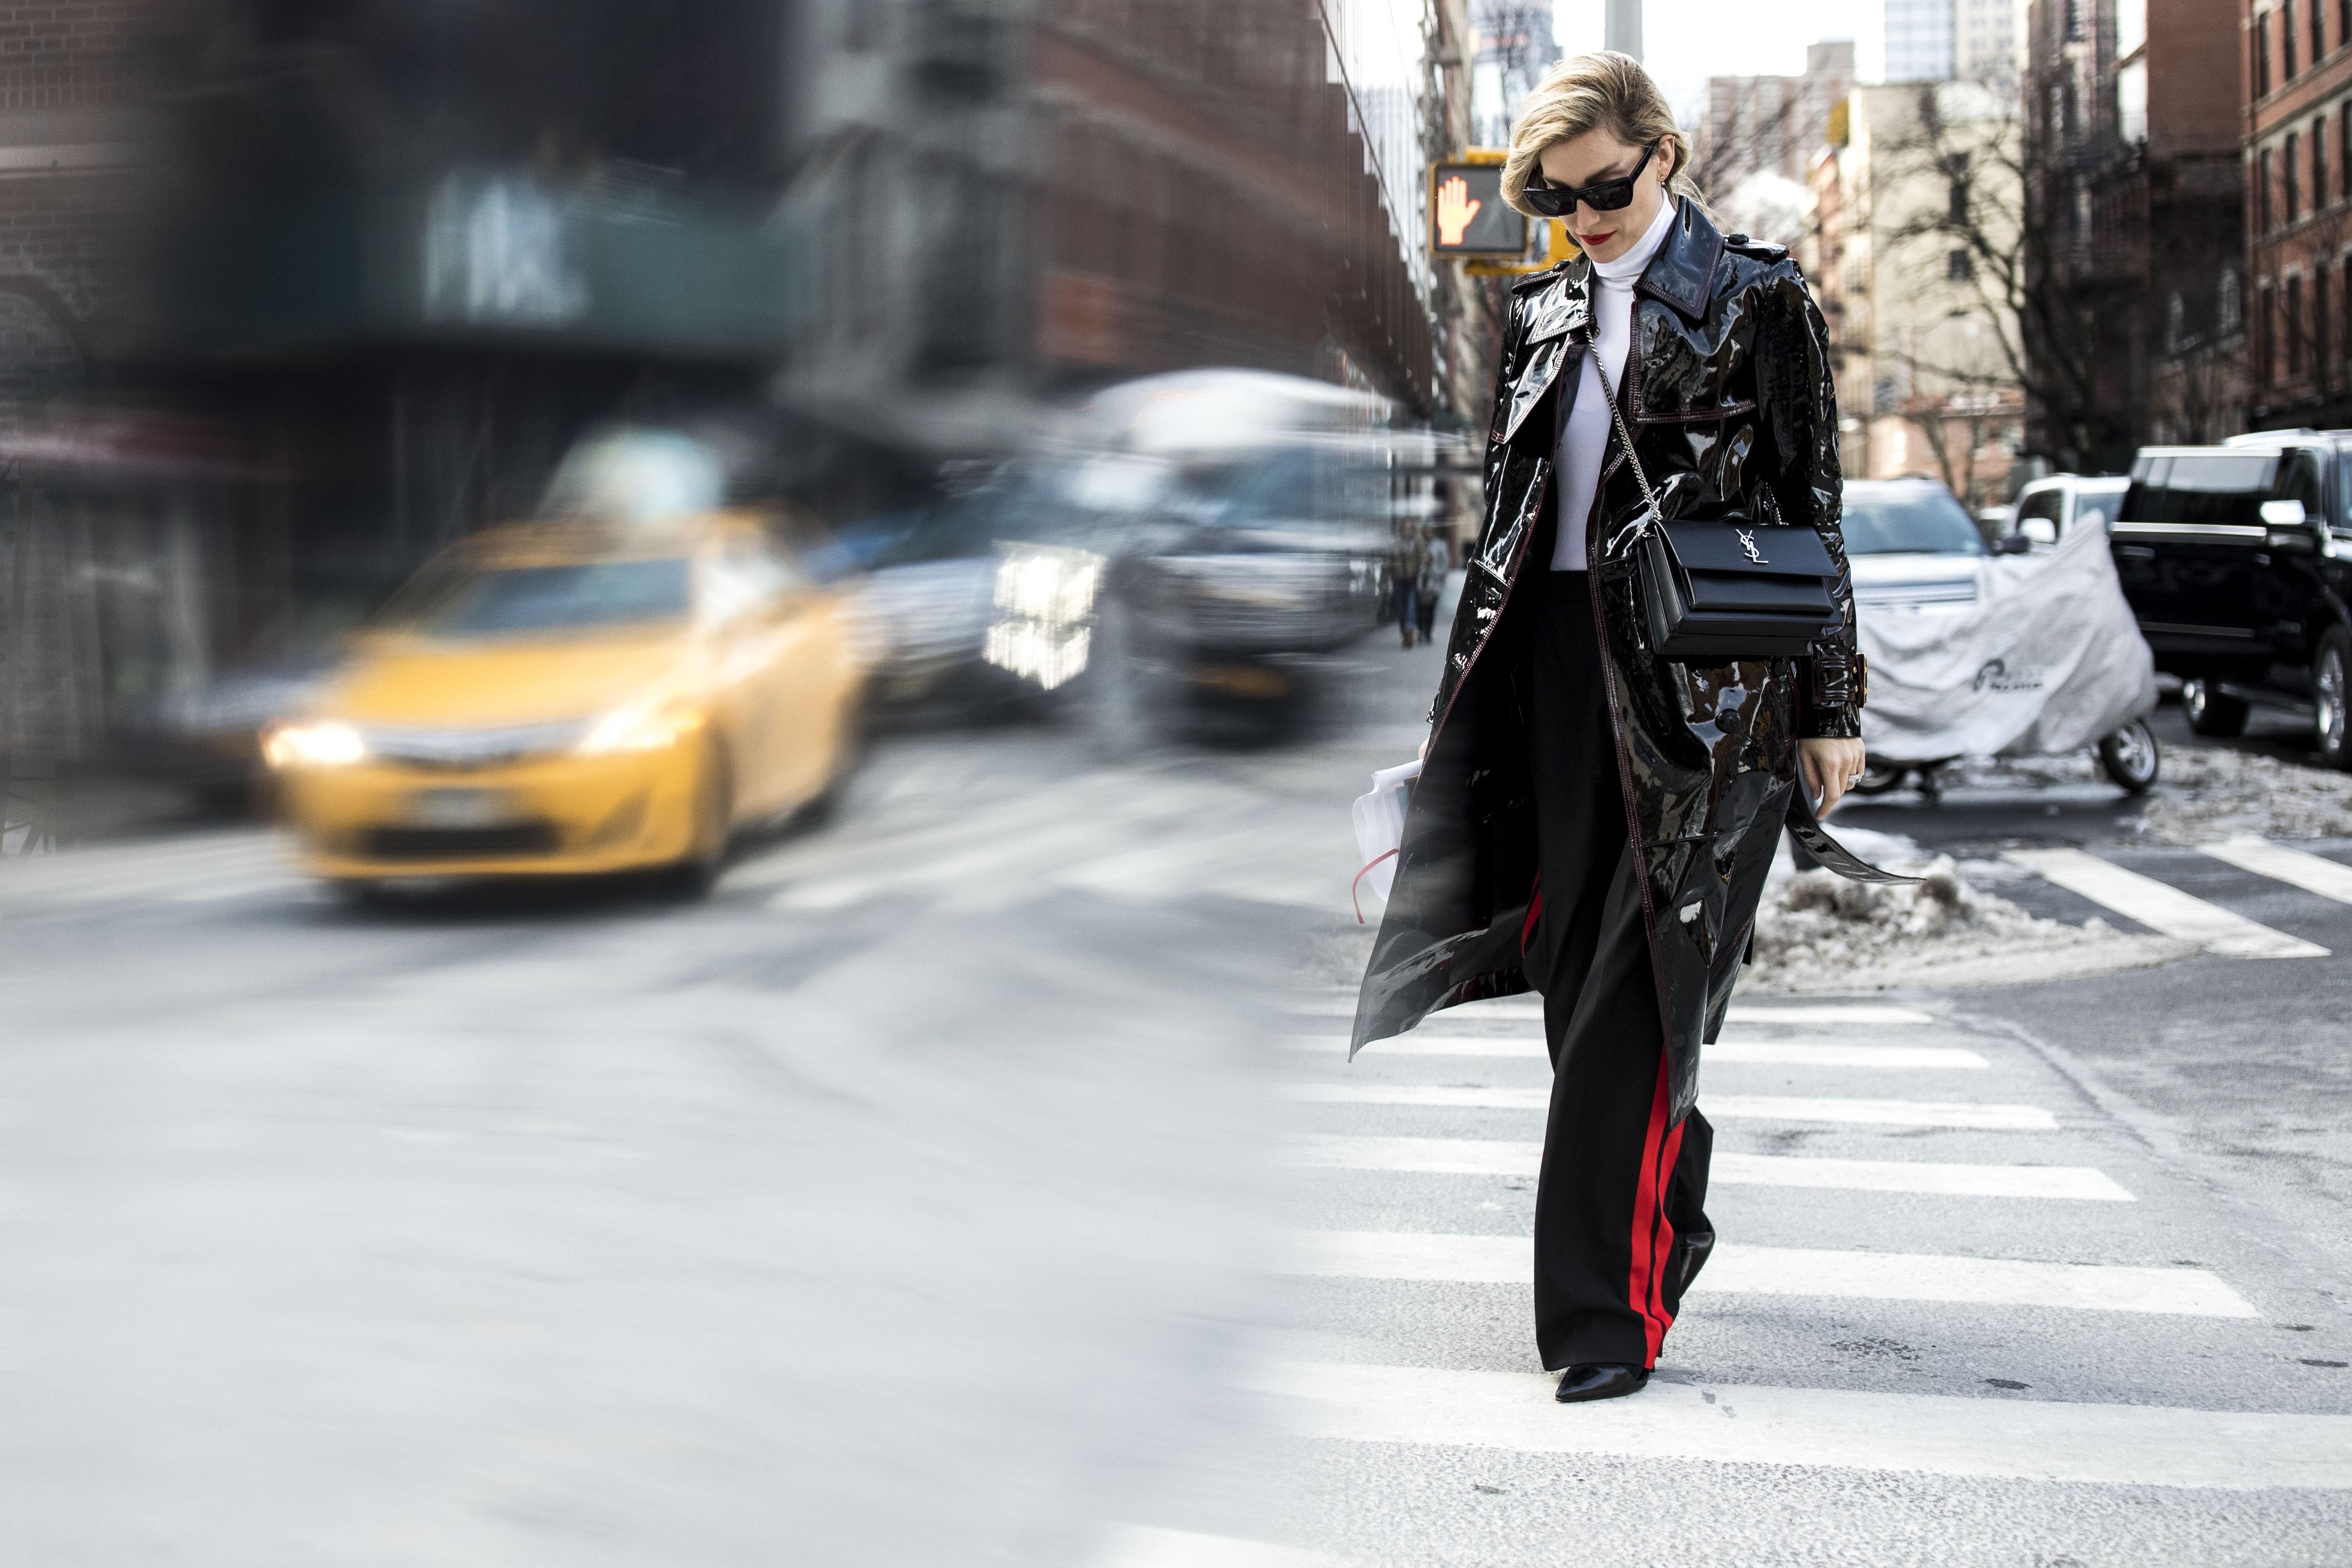 (Foto: Adriano Cisani / What A Street)